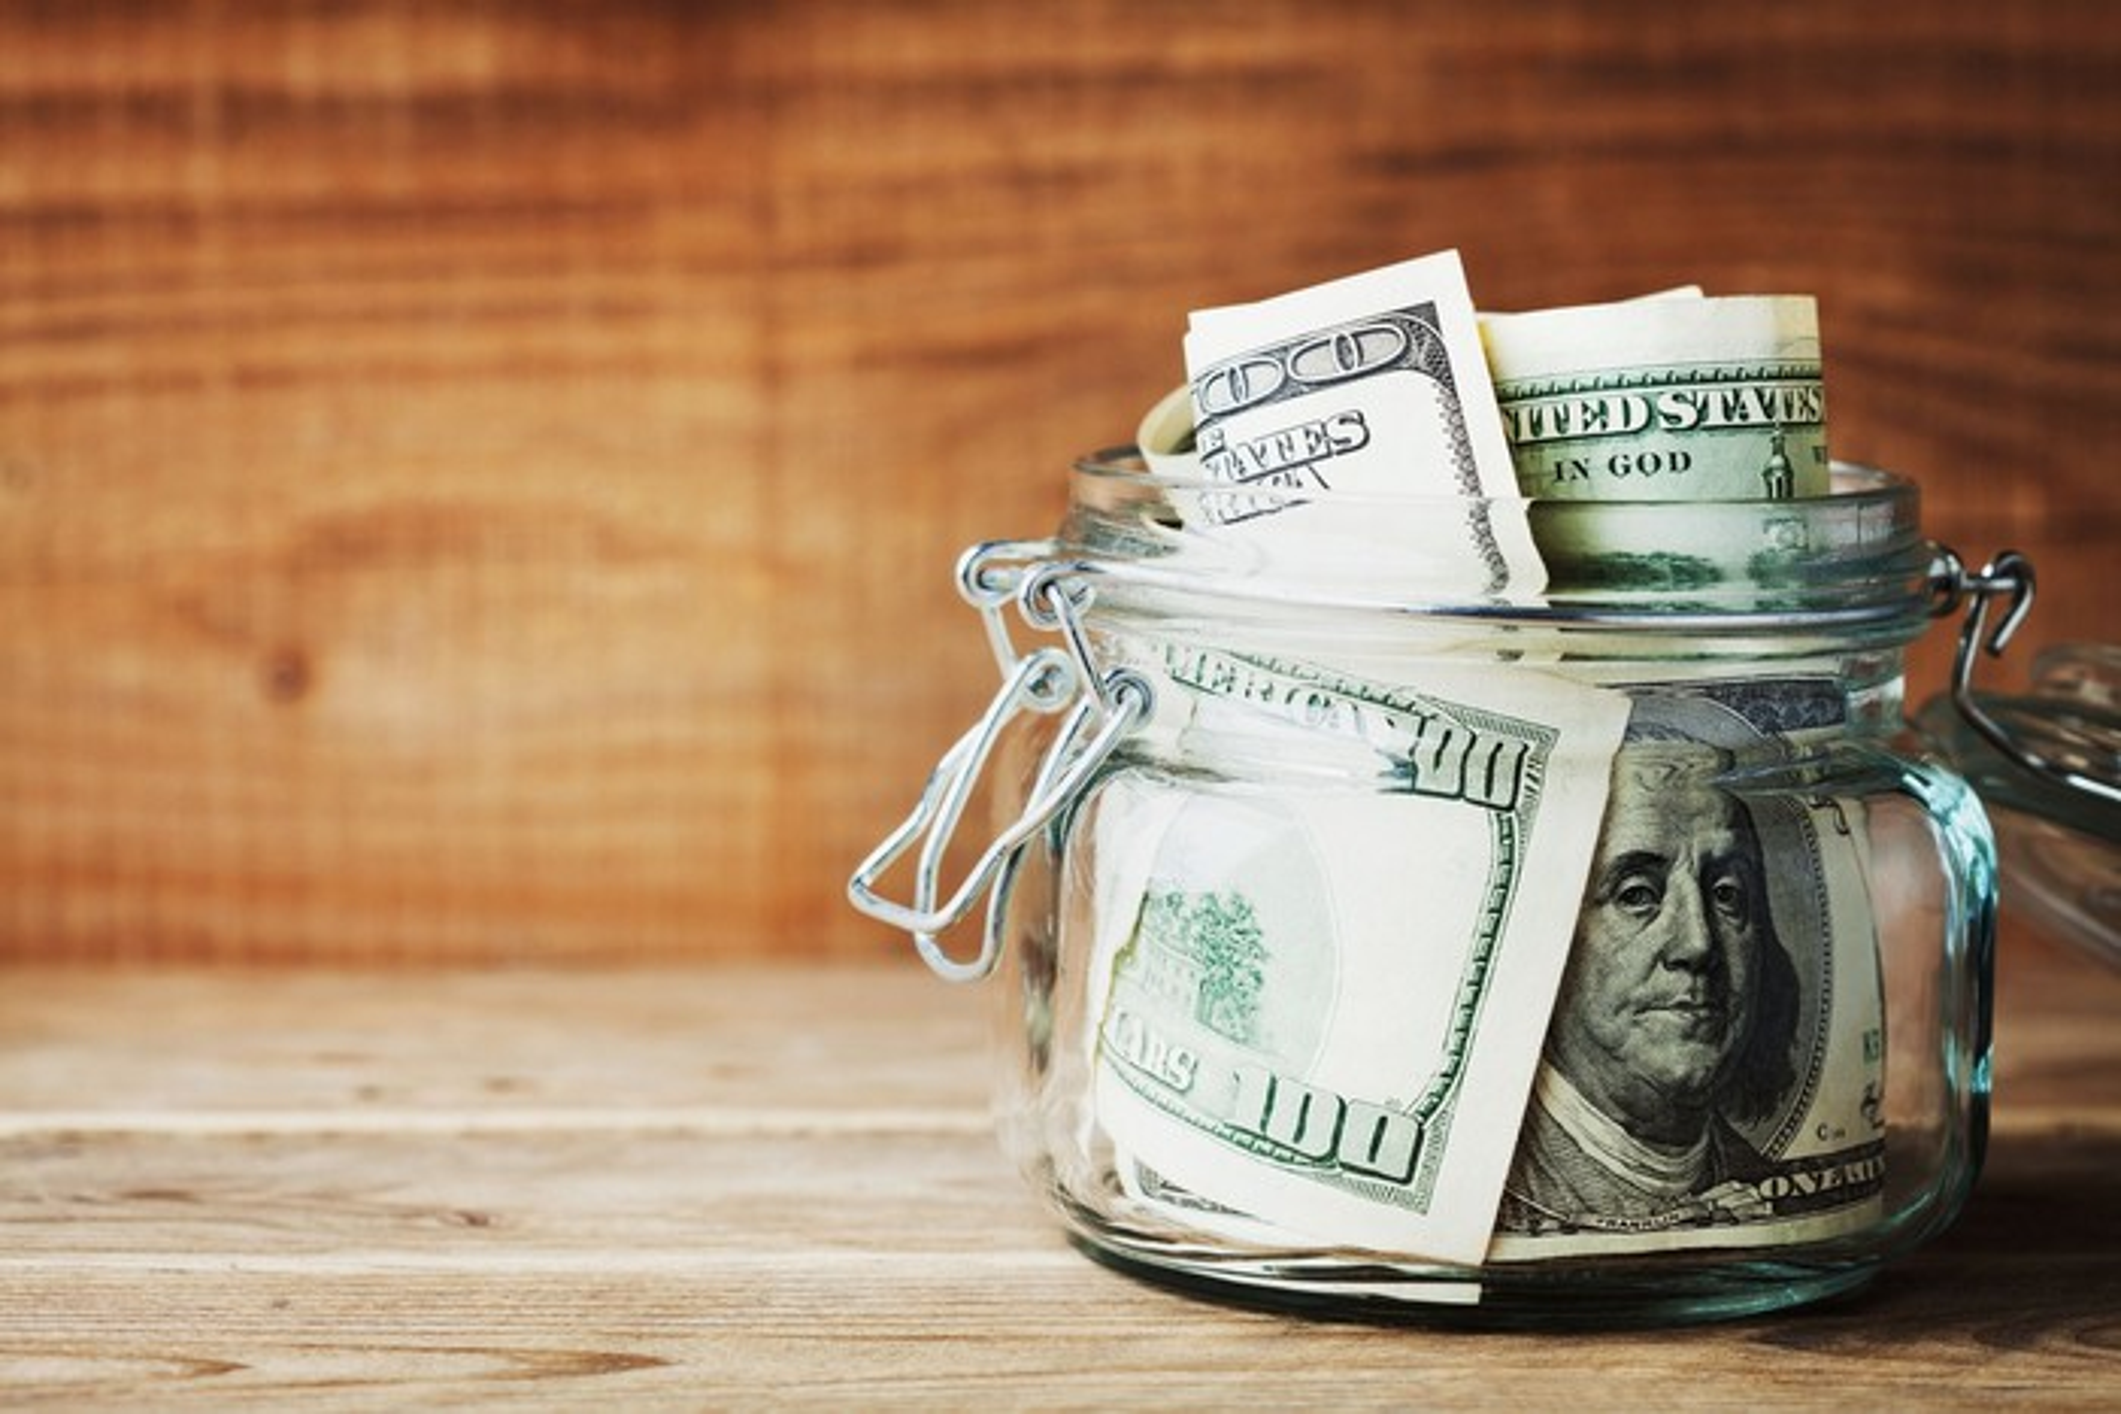 Jar full of $100 bills.